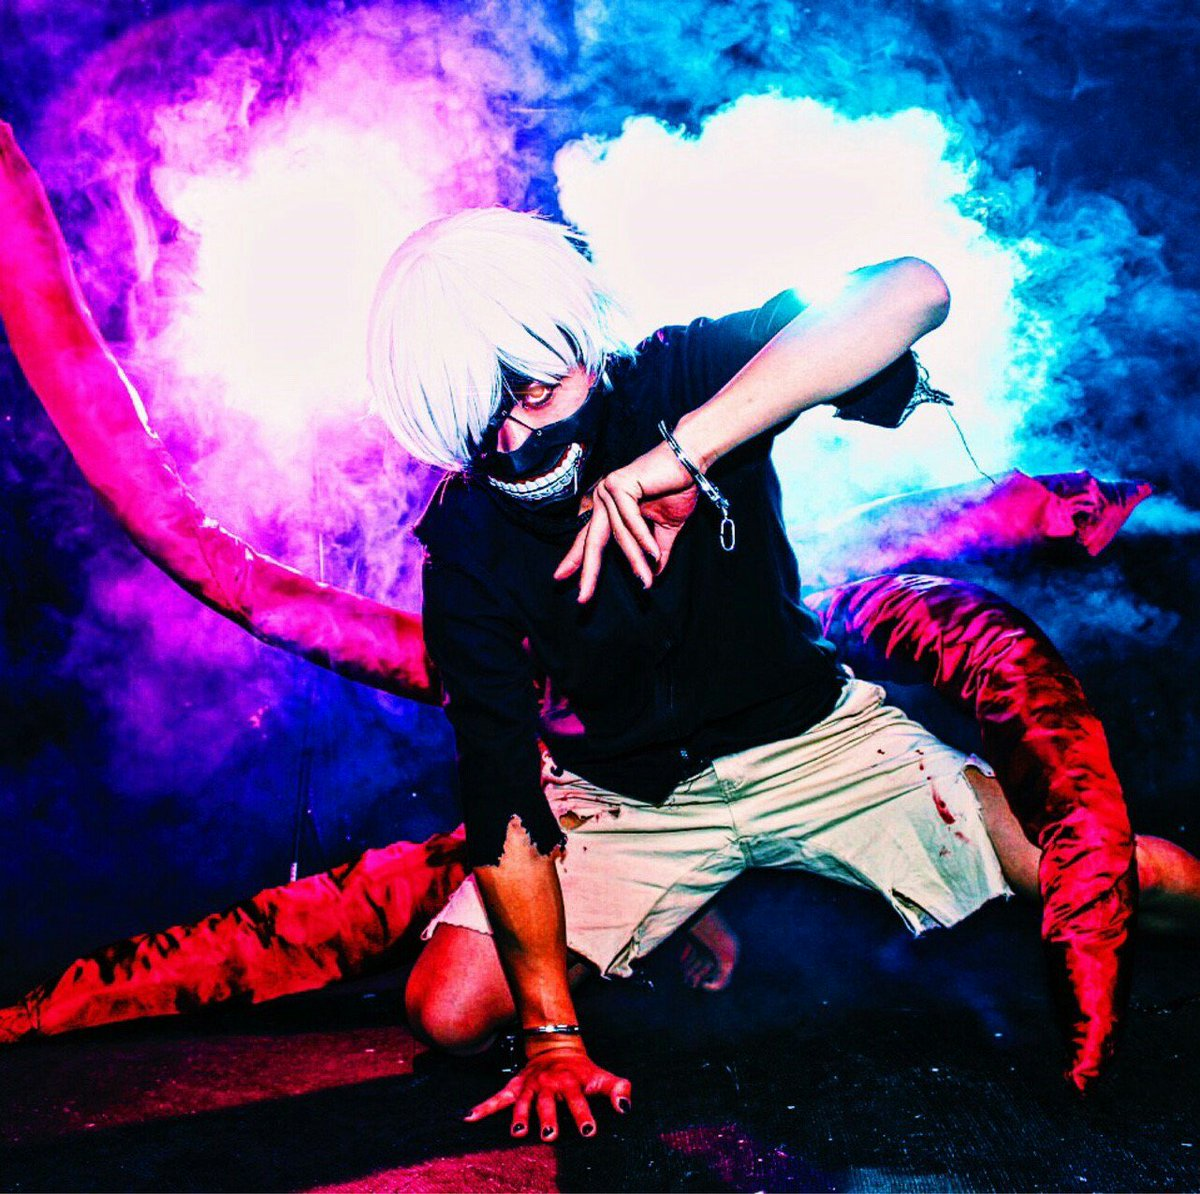 【Cosplay】3/26 クロームスタジオ東京喰種/金木 研スモーク撮影をしてきました!!素敵なお写真をありがとうござ